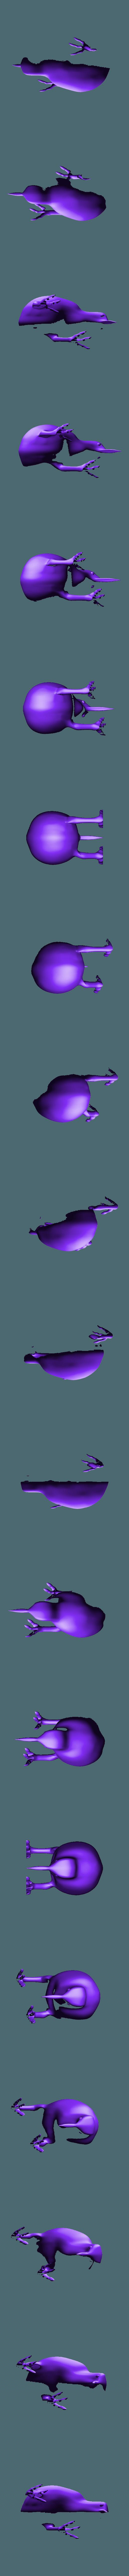 Kiwi_Smooth_no_egg.stl Download free STL file Kiwi • Model to 3D print, Oggie